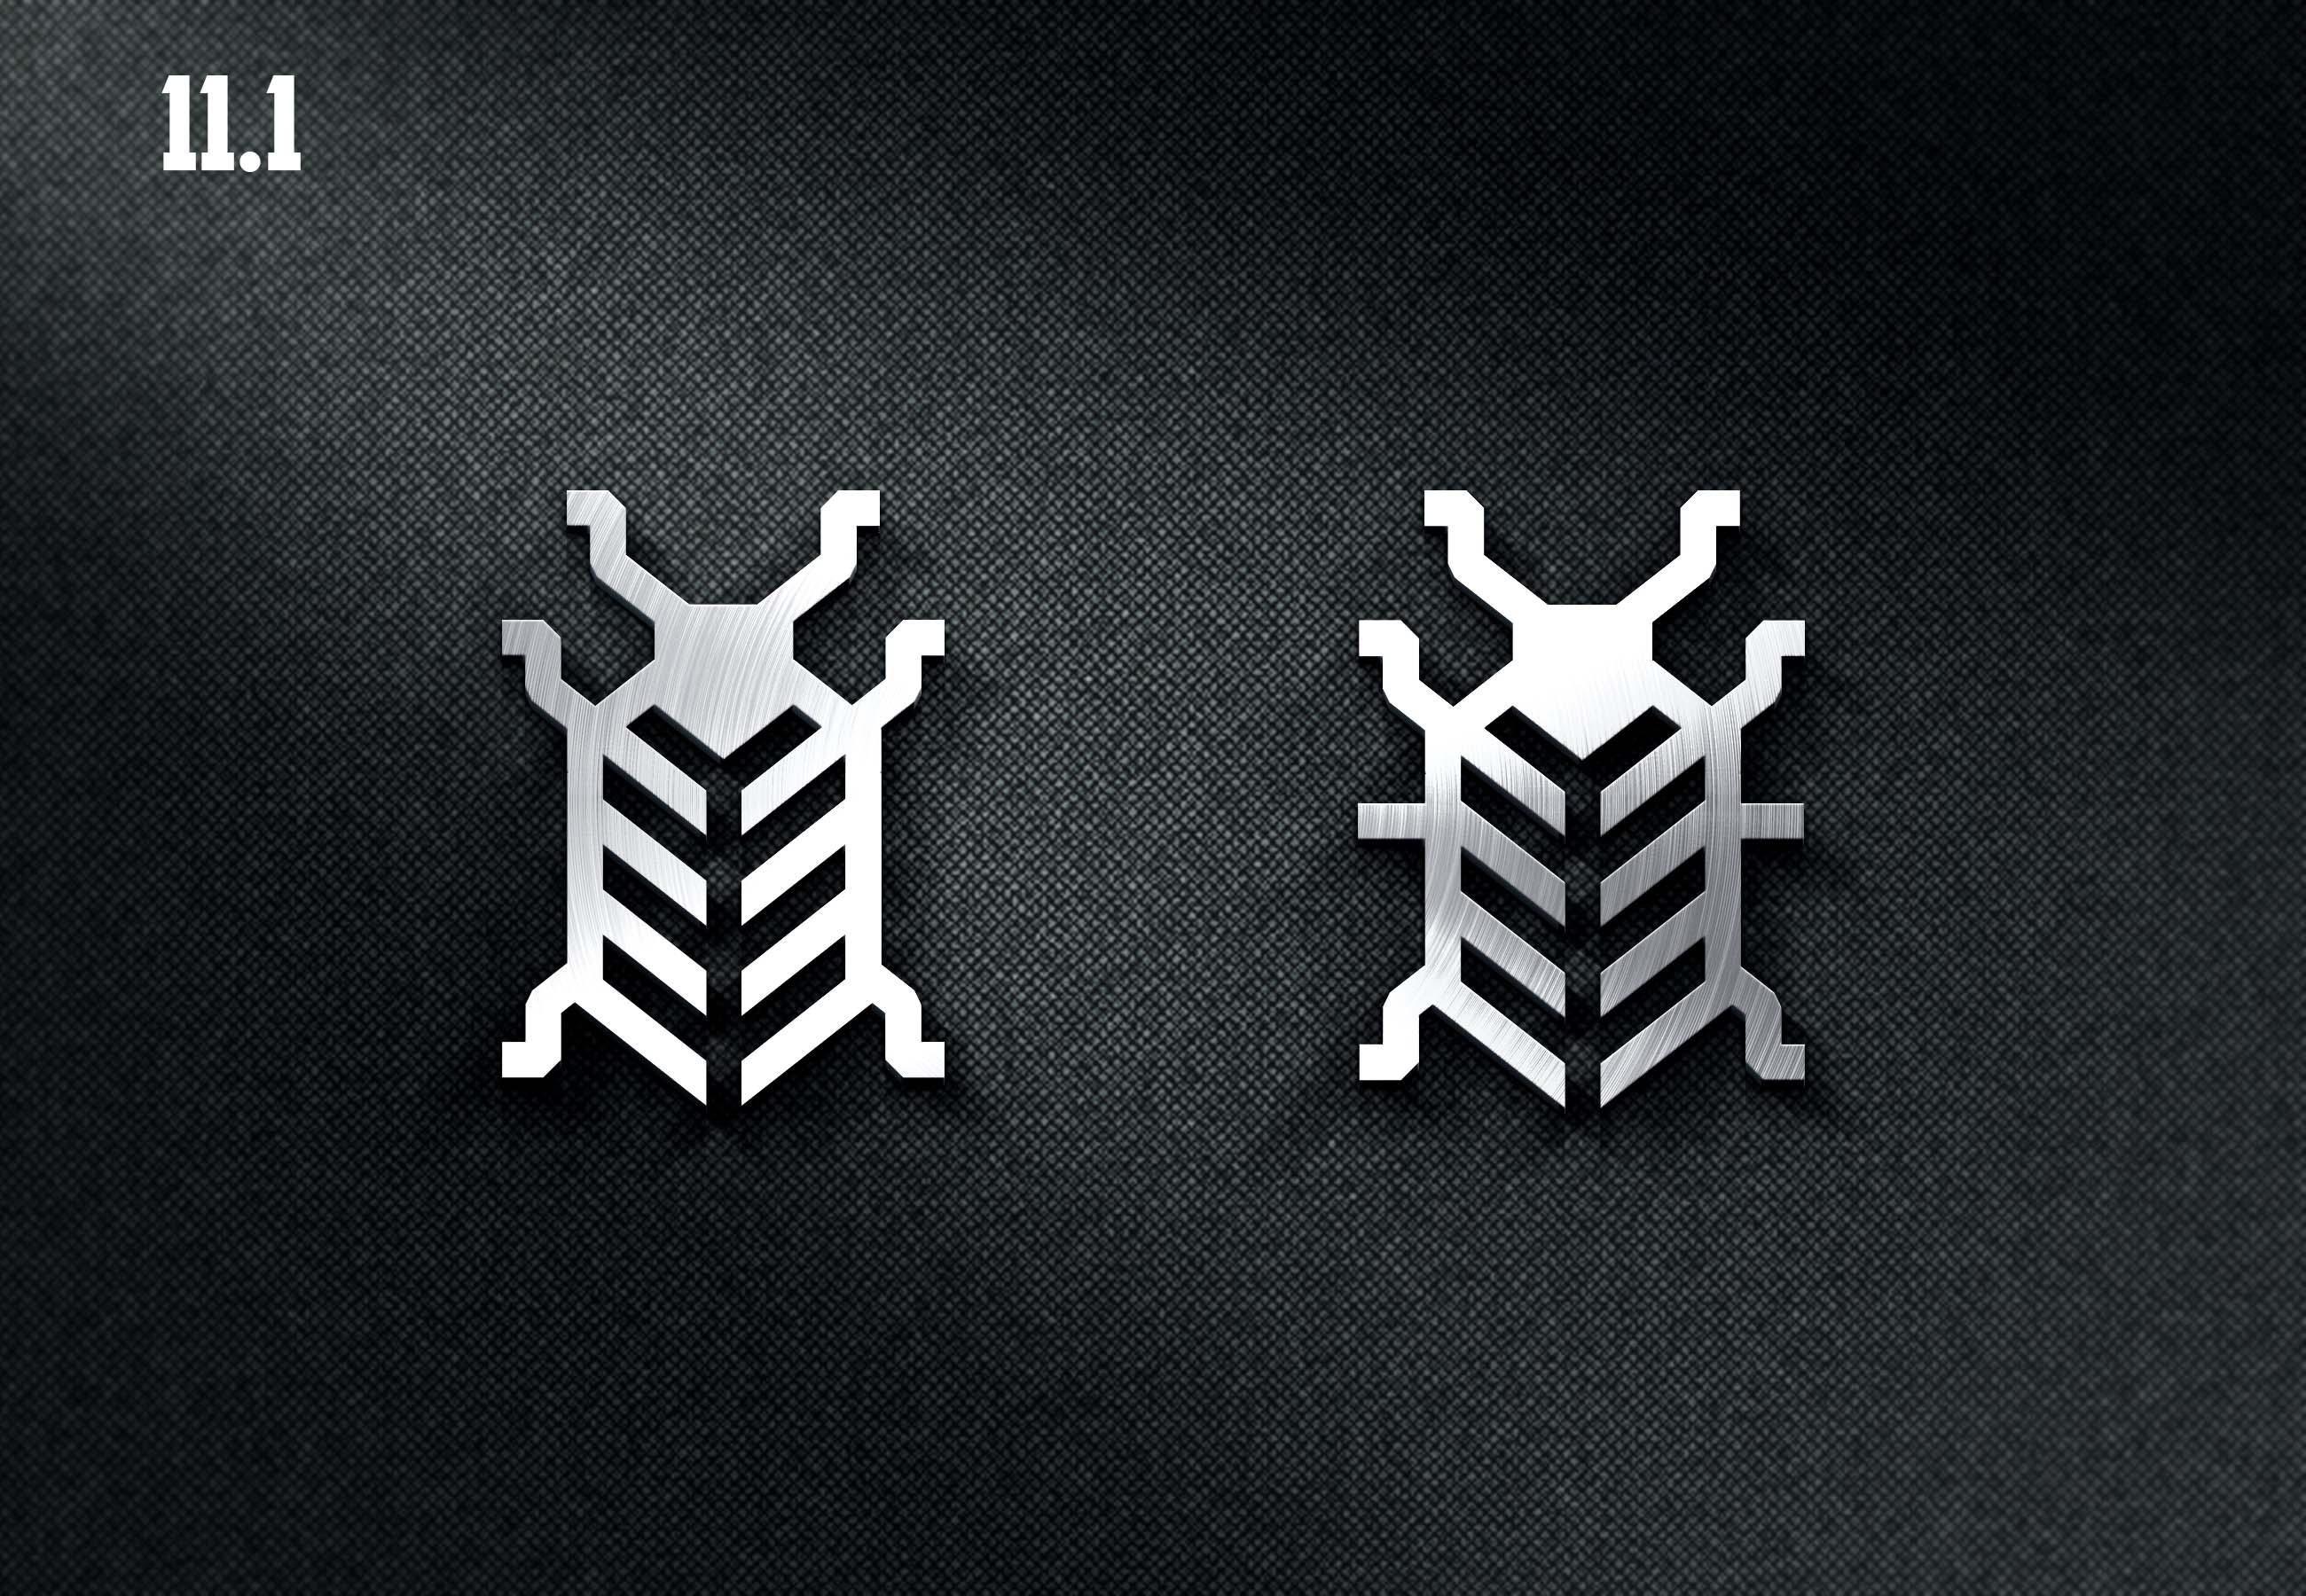 Нужен логотип (эмблема) для самодельного квадроцикла фото f_1785b1033d3ef391.jpg